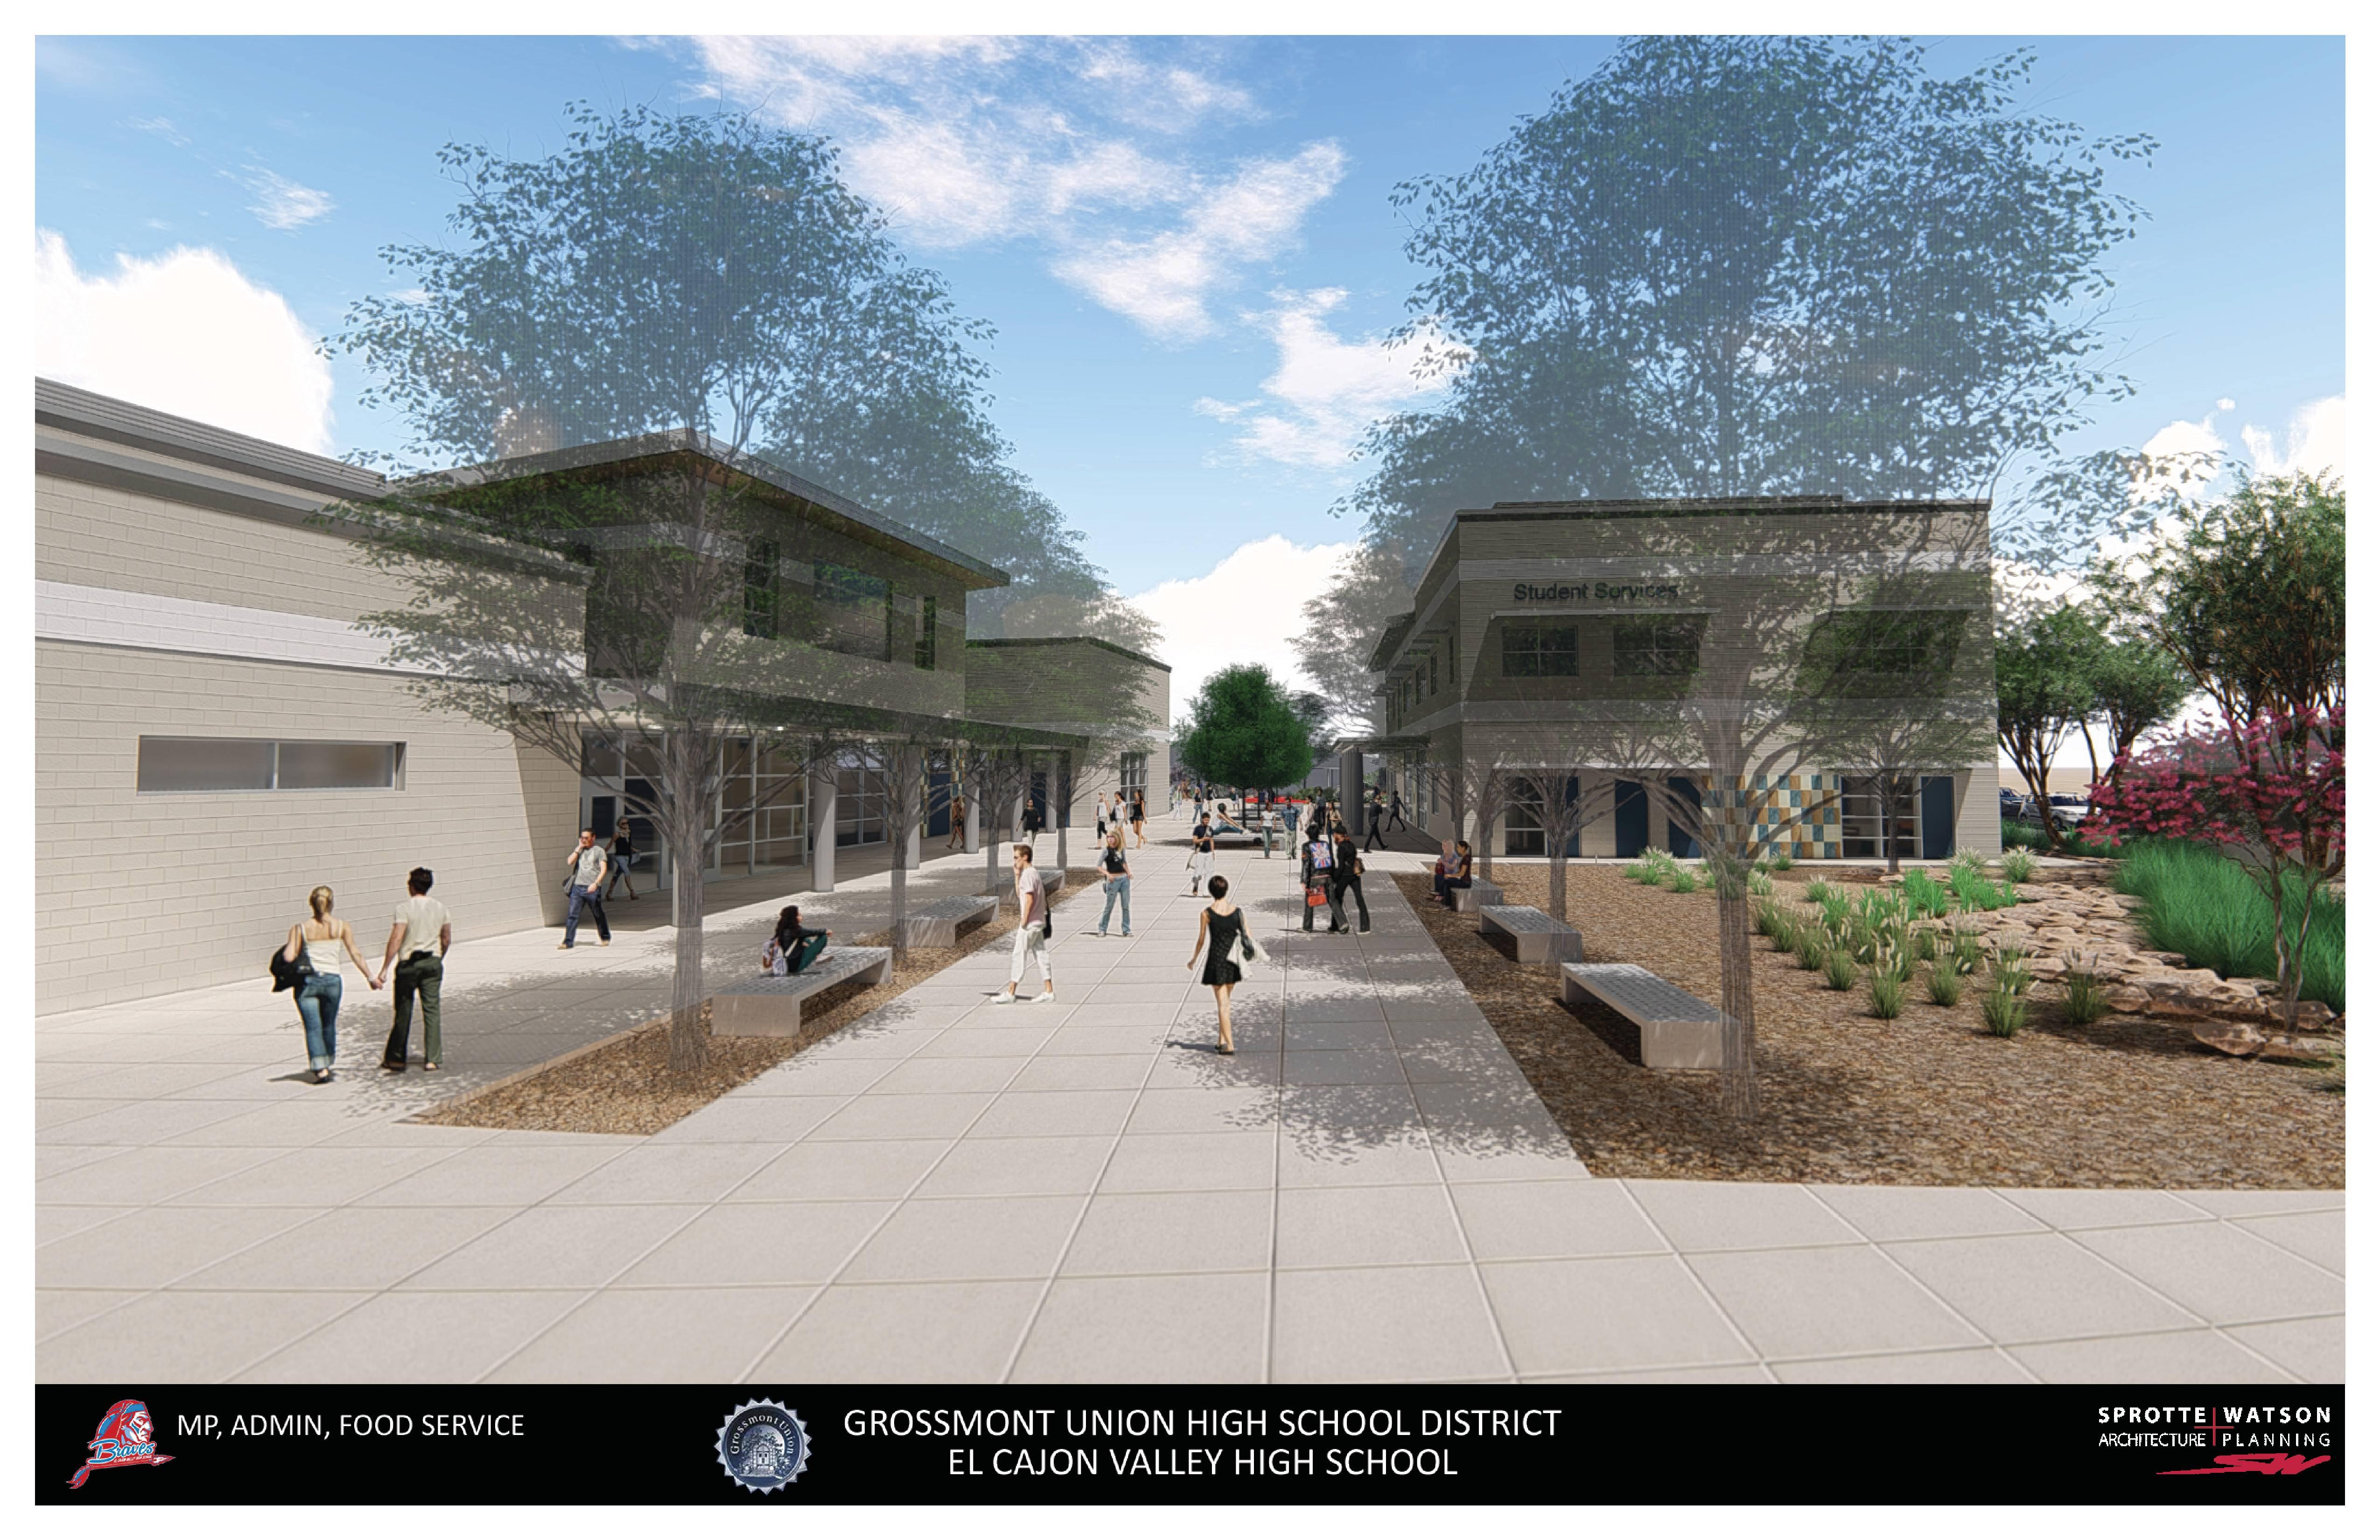 El Cajon Valley High School – Construction Update Intended For El Cajon School District Holiday Schedule